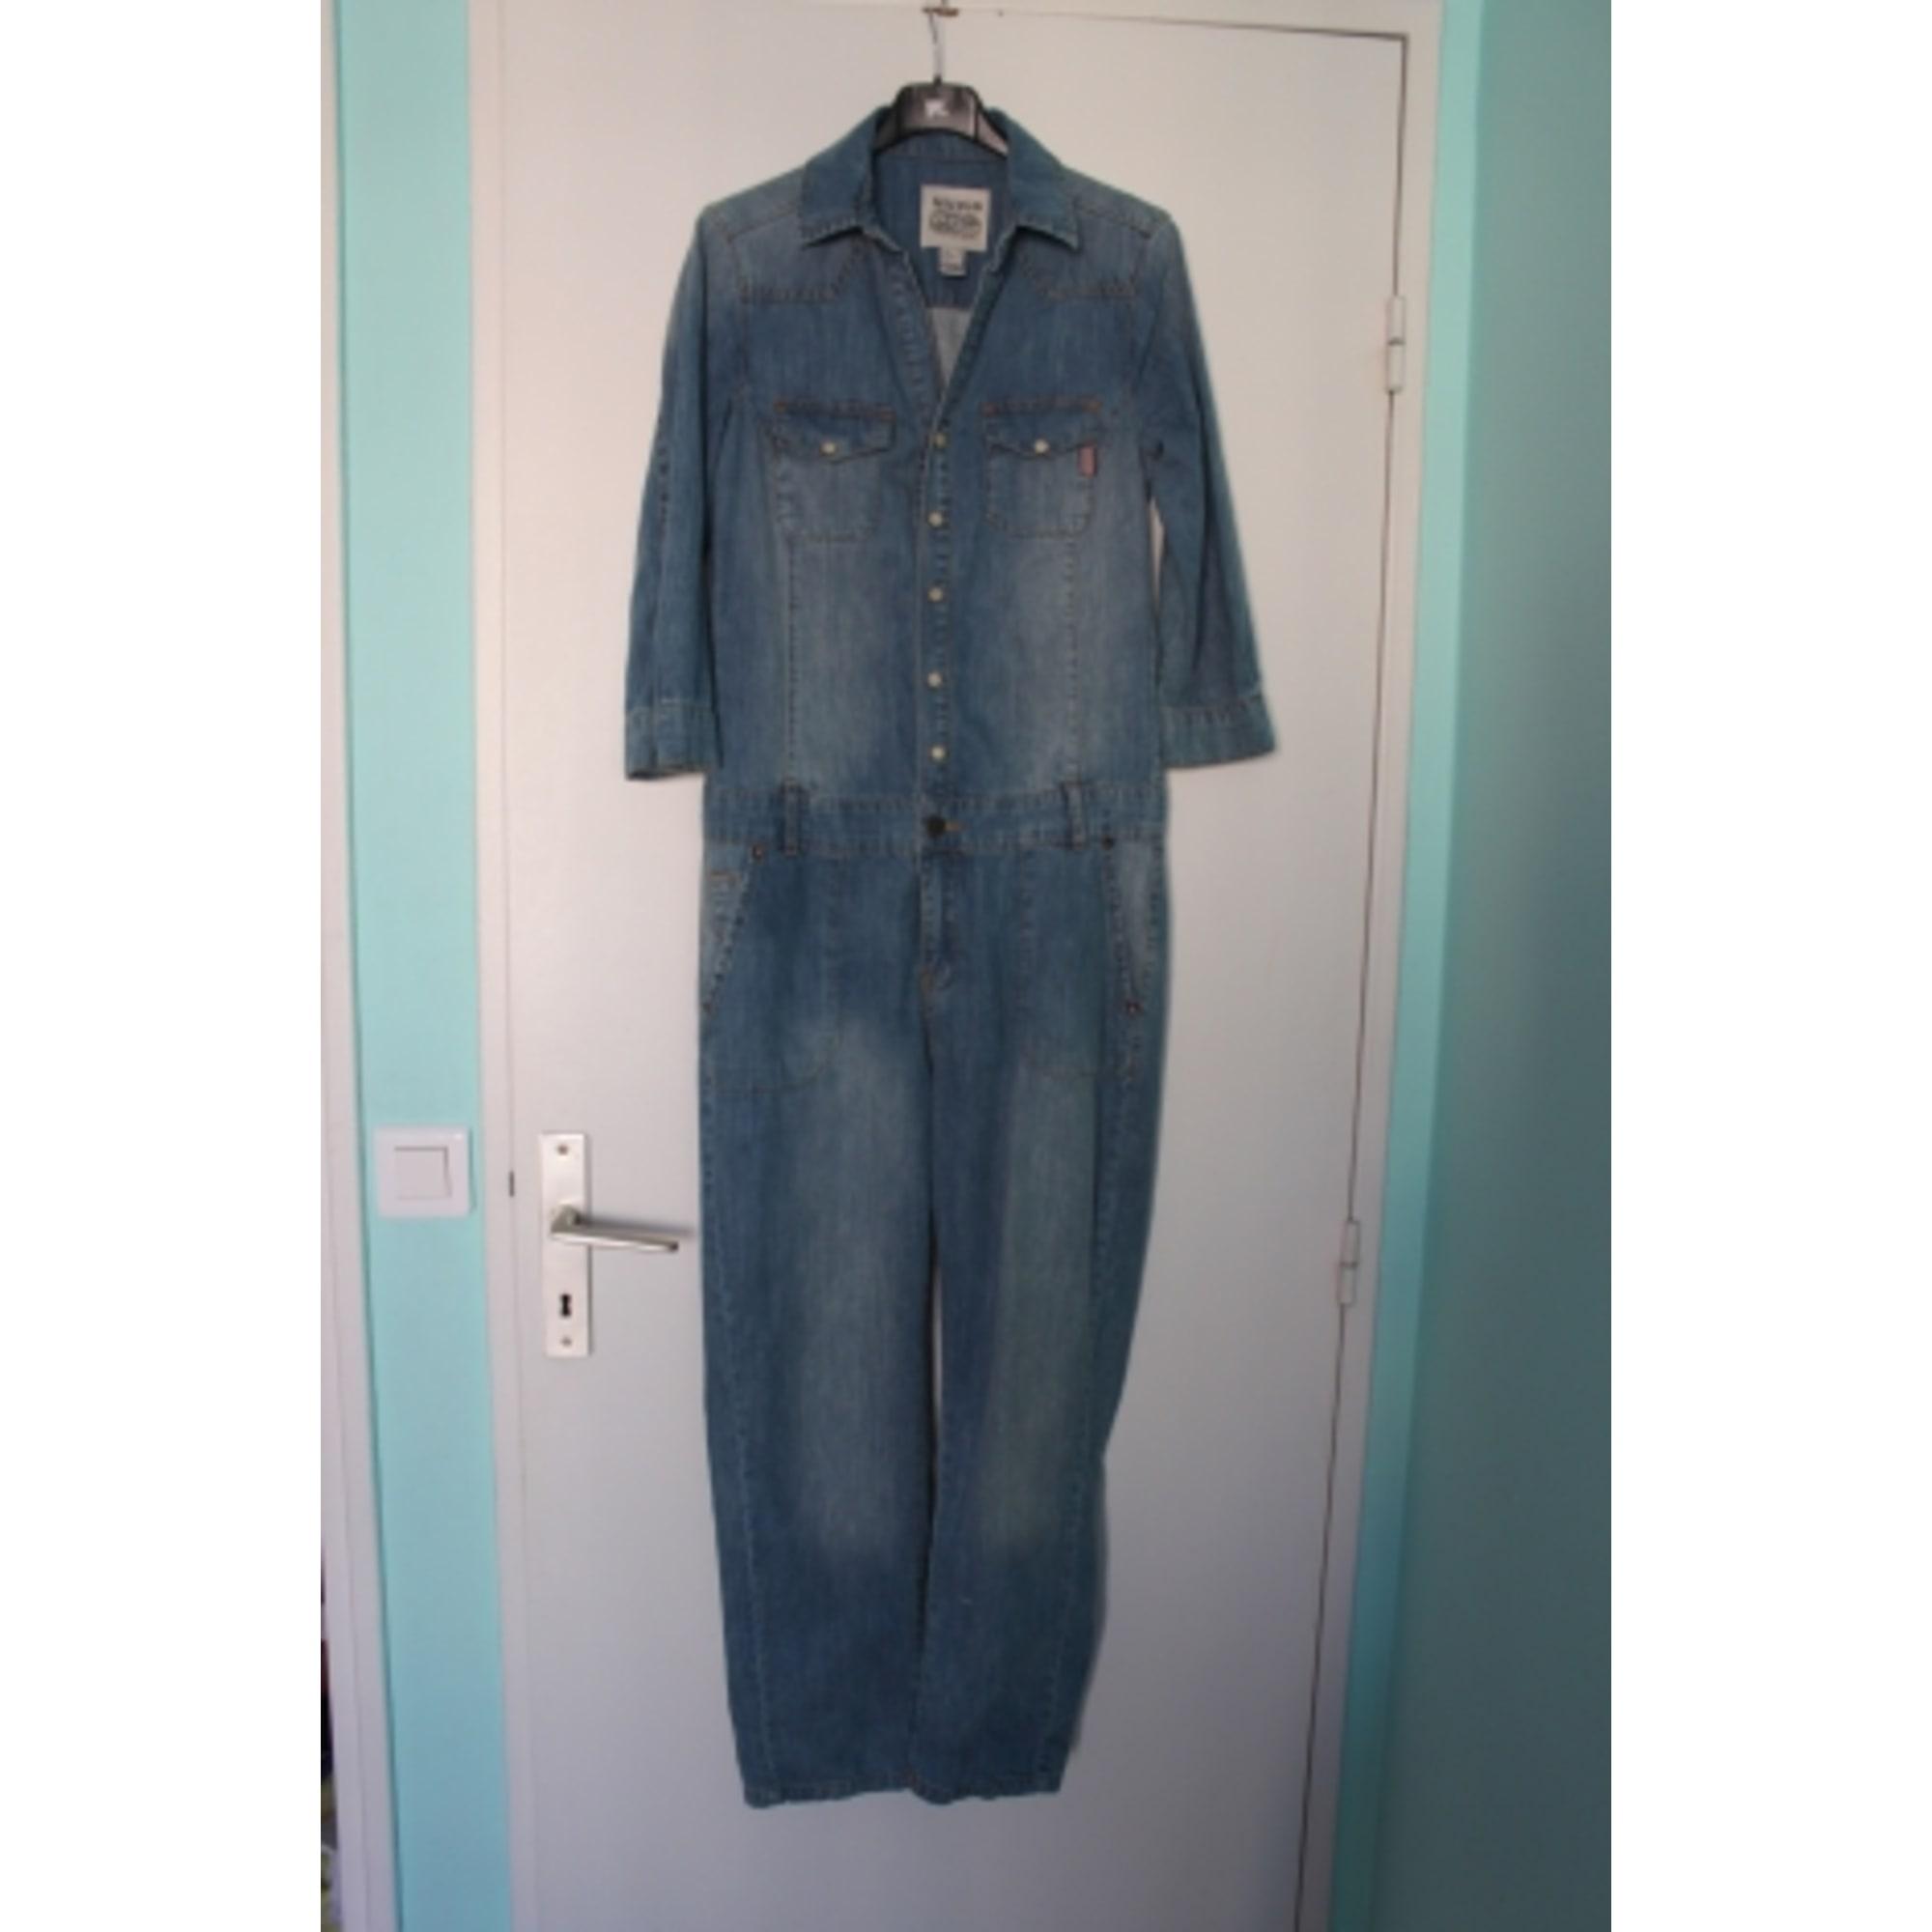 Combinaison MANGO 36 (S, T1) jeans vendu par Ylana5559013 - 1976770 0f79dd013991